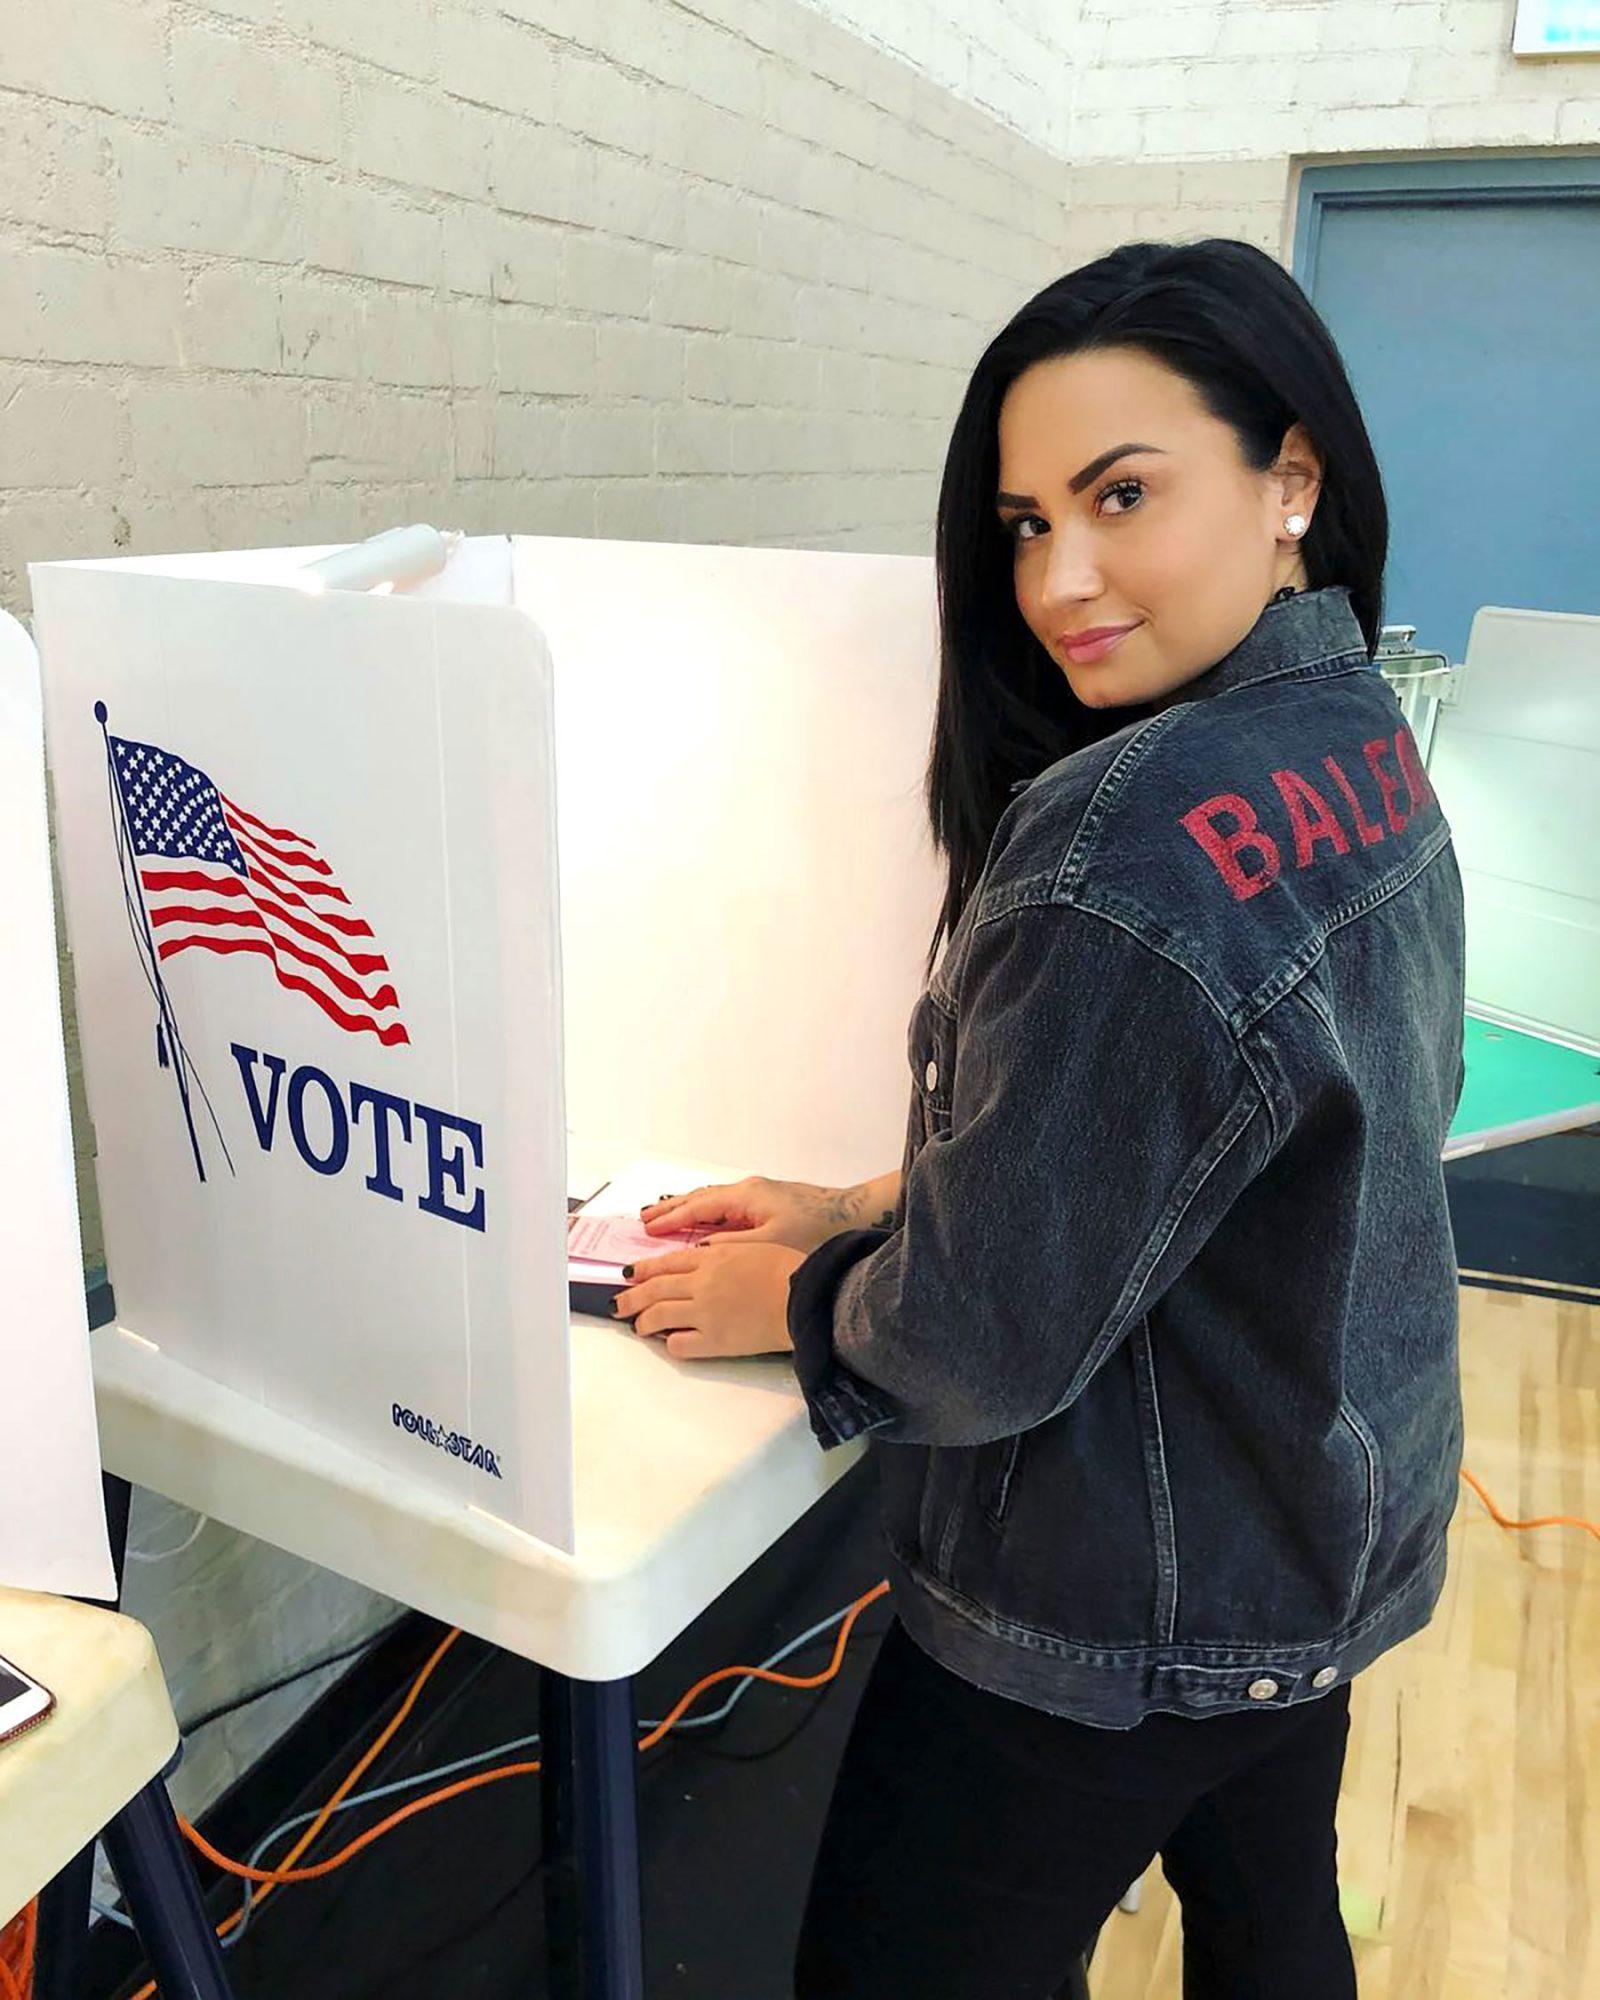 Demi Lovato: https://www.instagram.com/p/Bp2jlPwh53d/Demi Lovato/Instagram